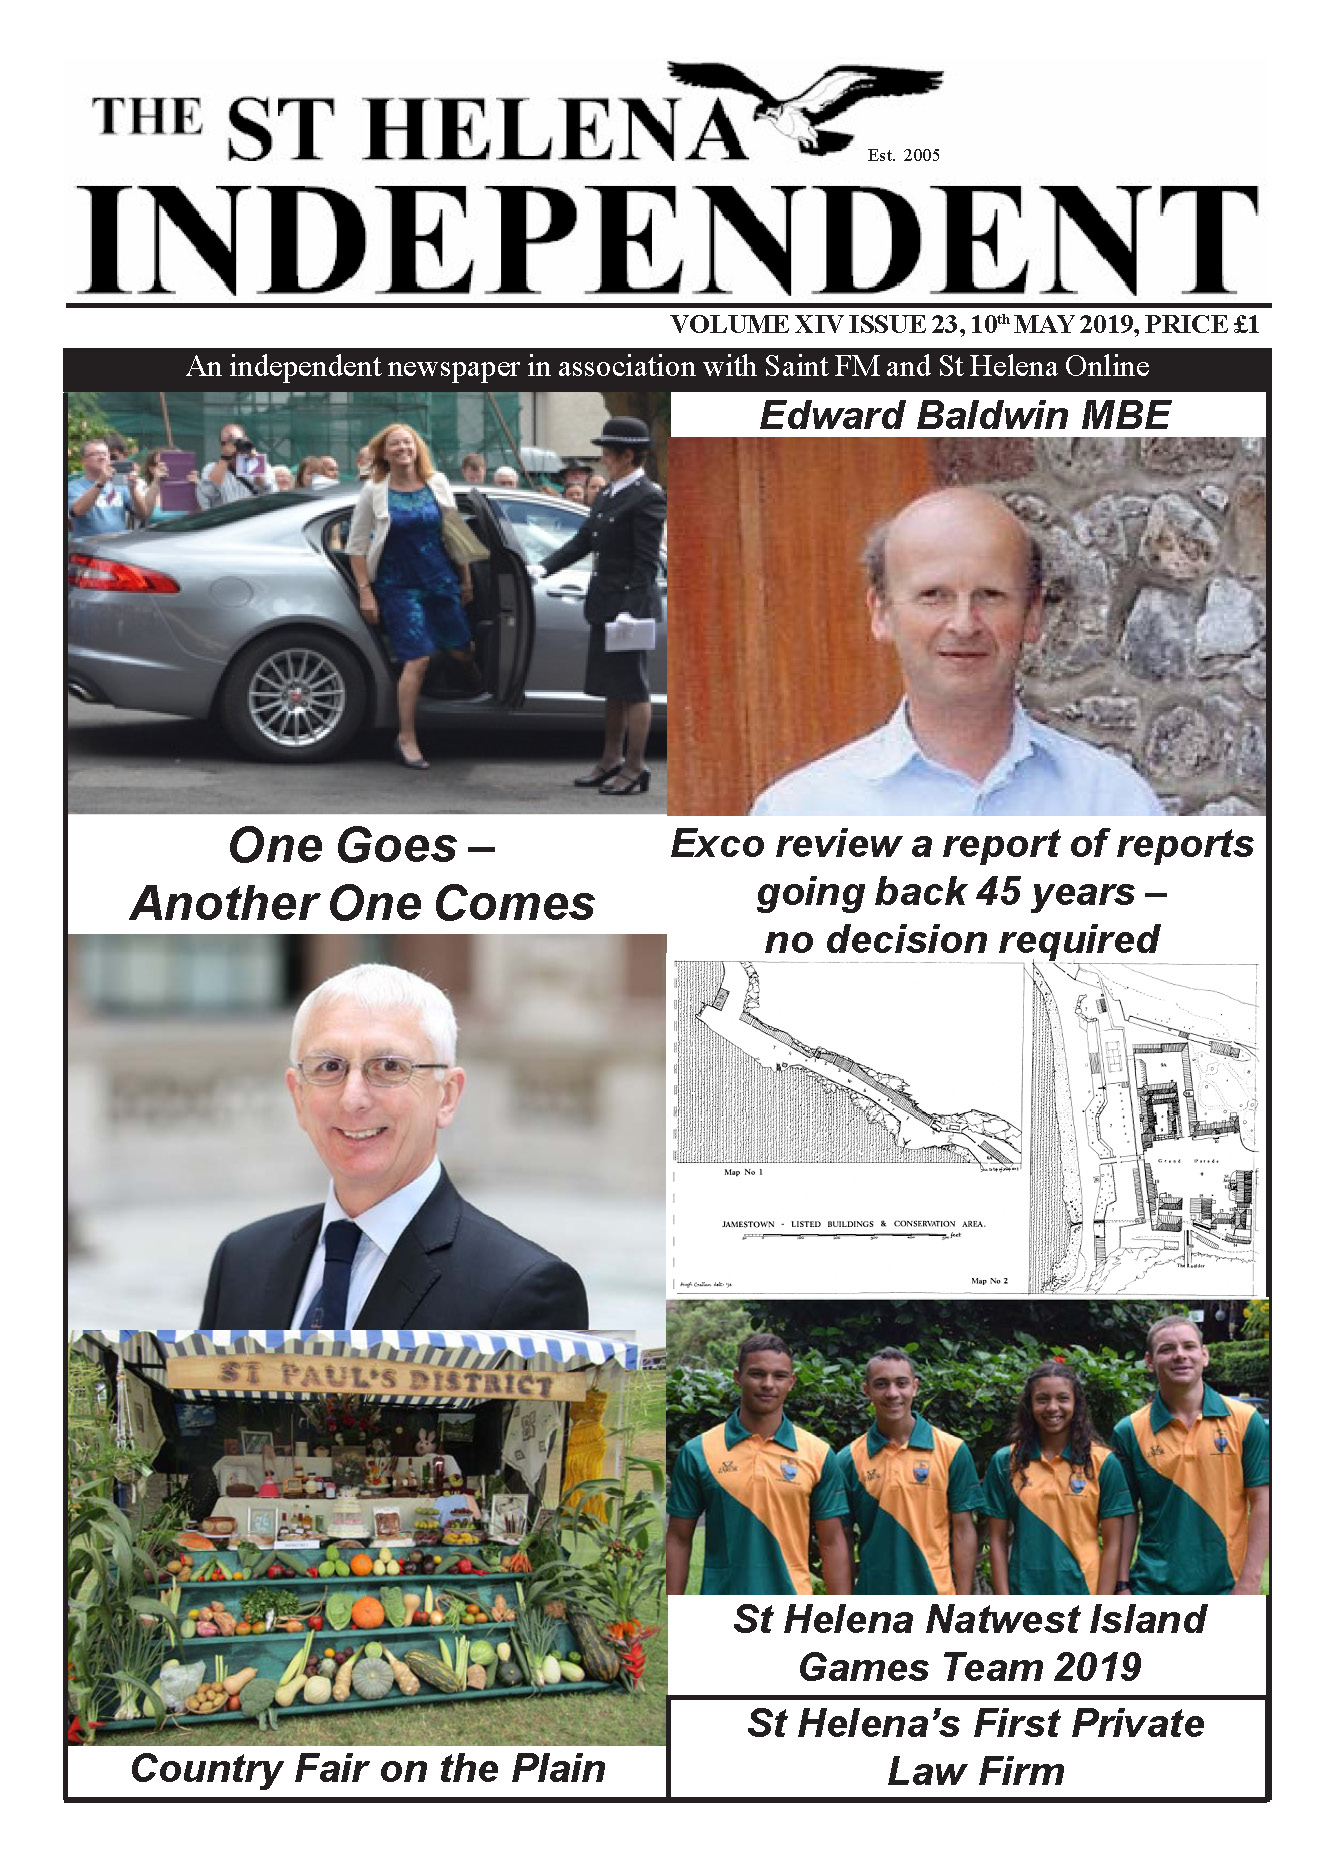 St Helena Independent 20190510